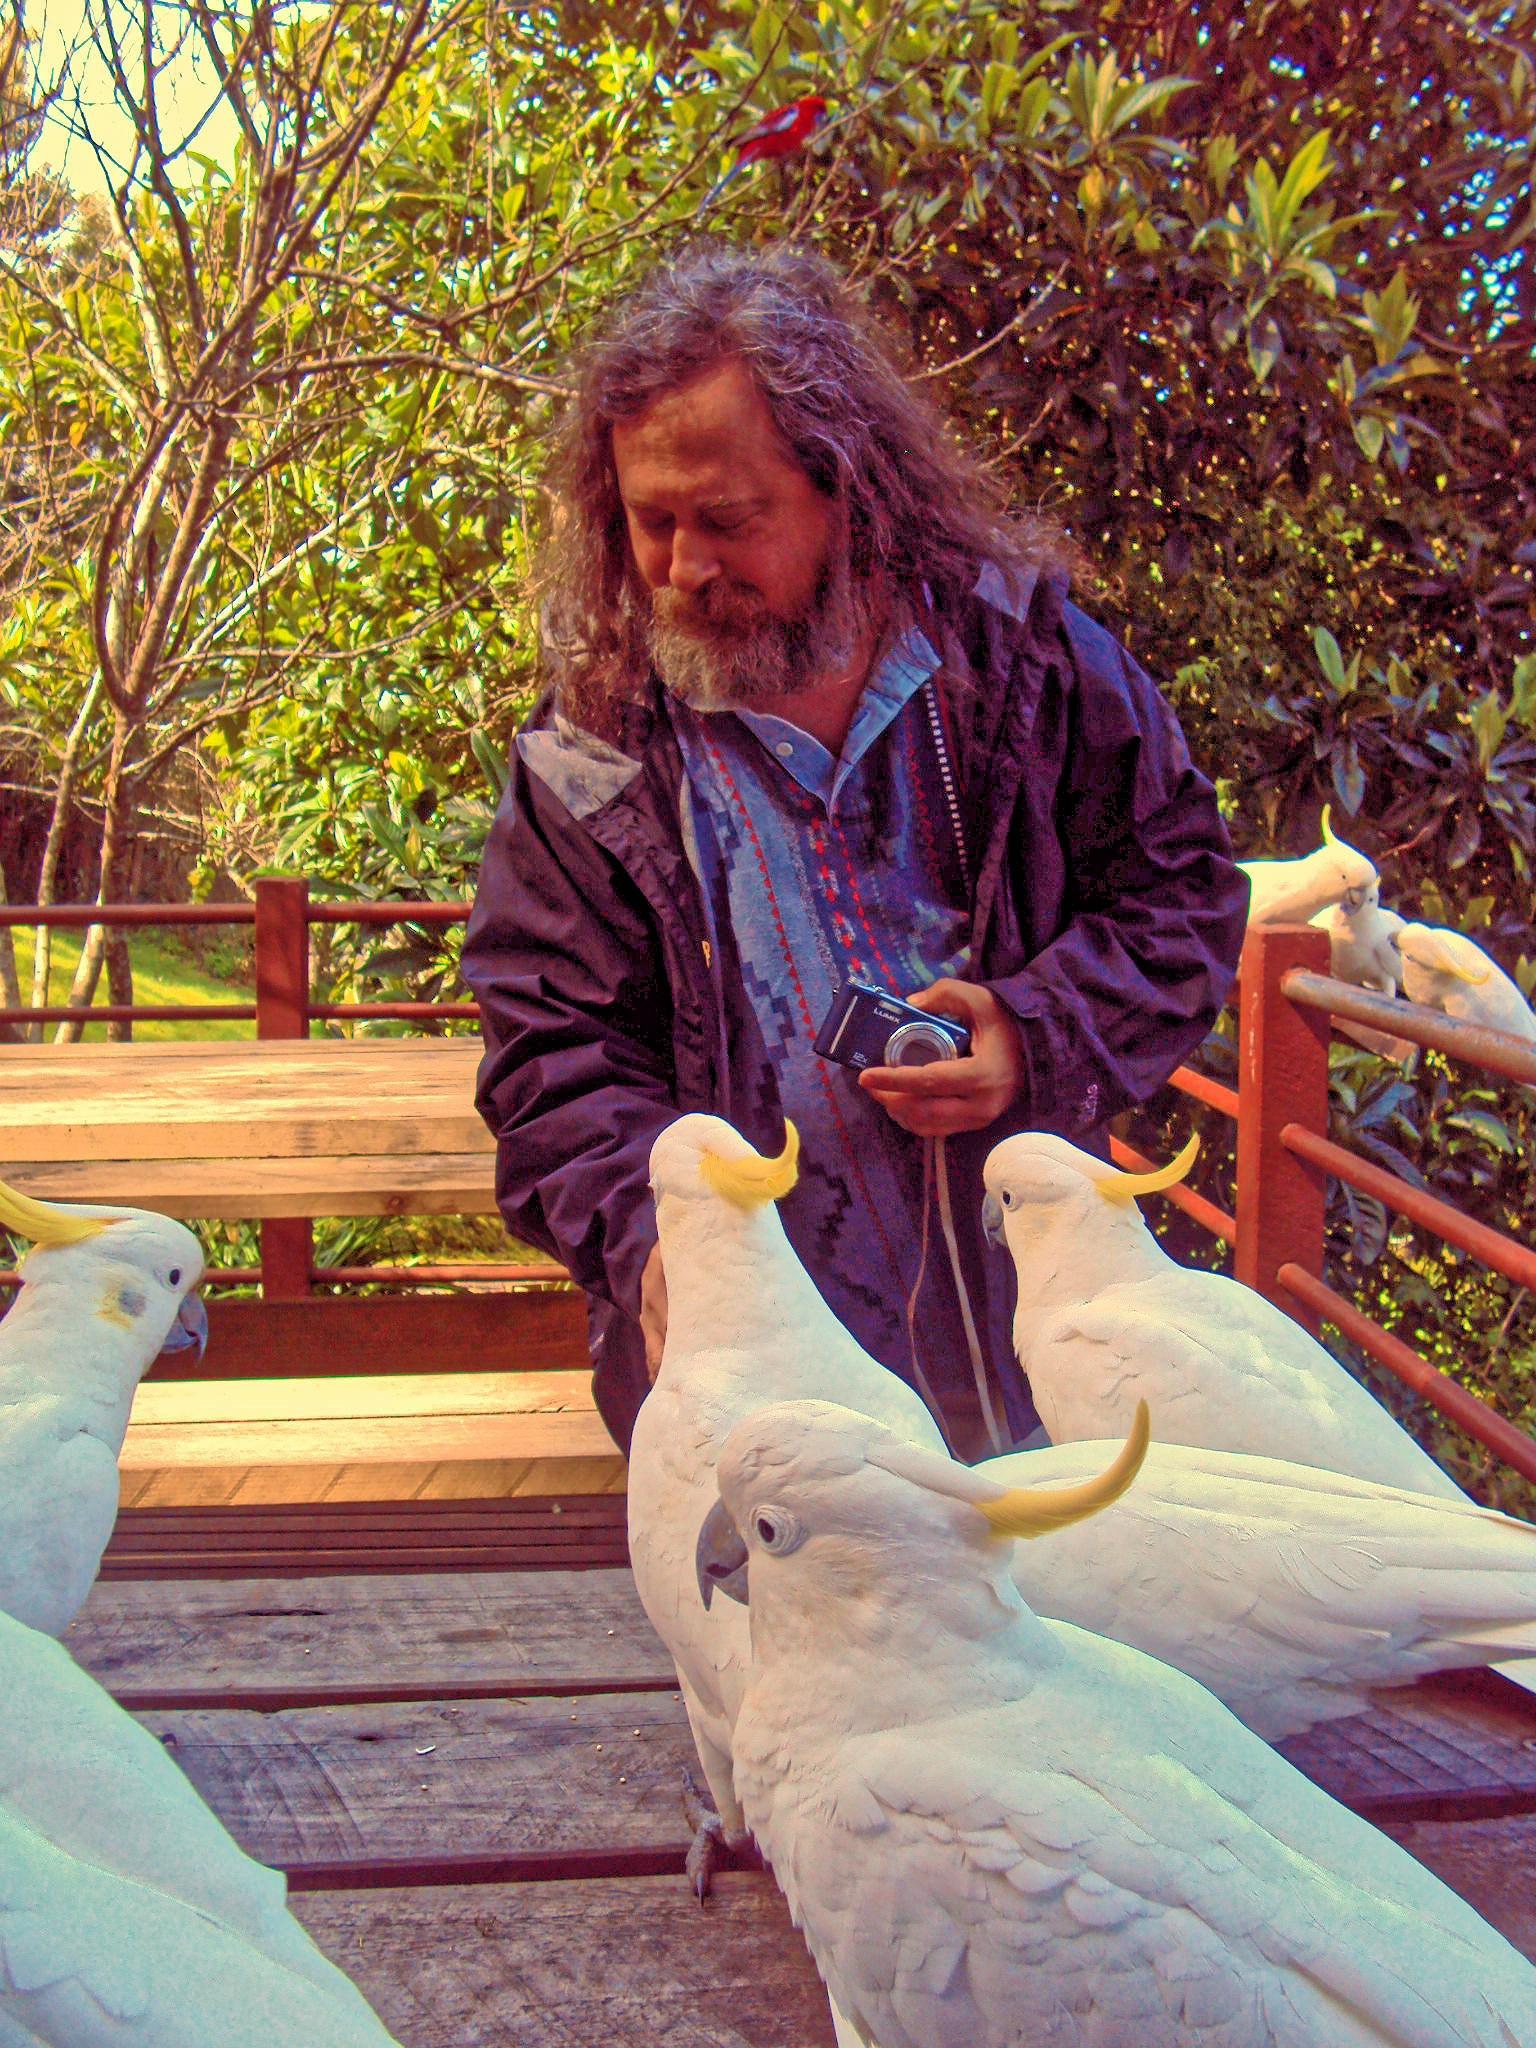 rms-and-birds-3.jpeg